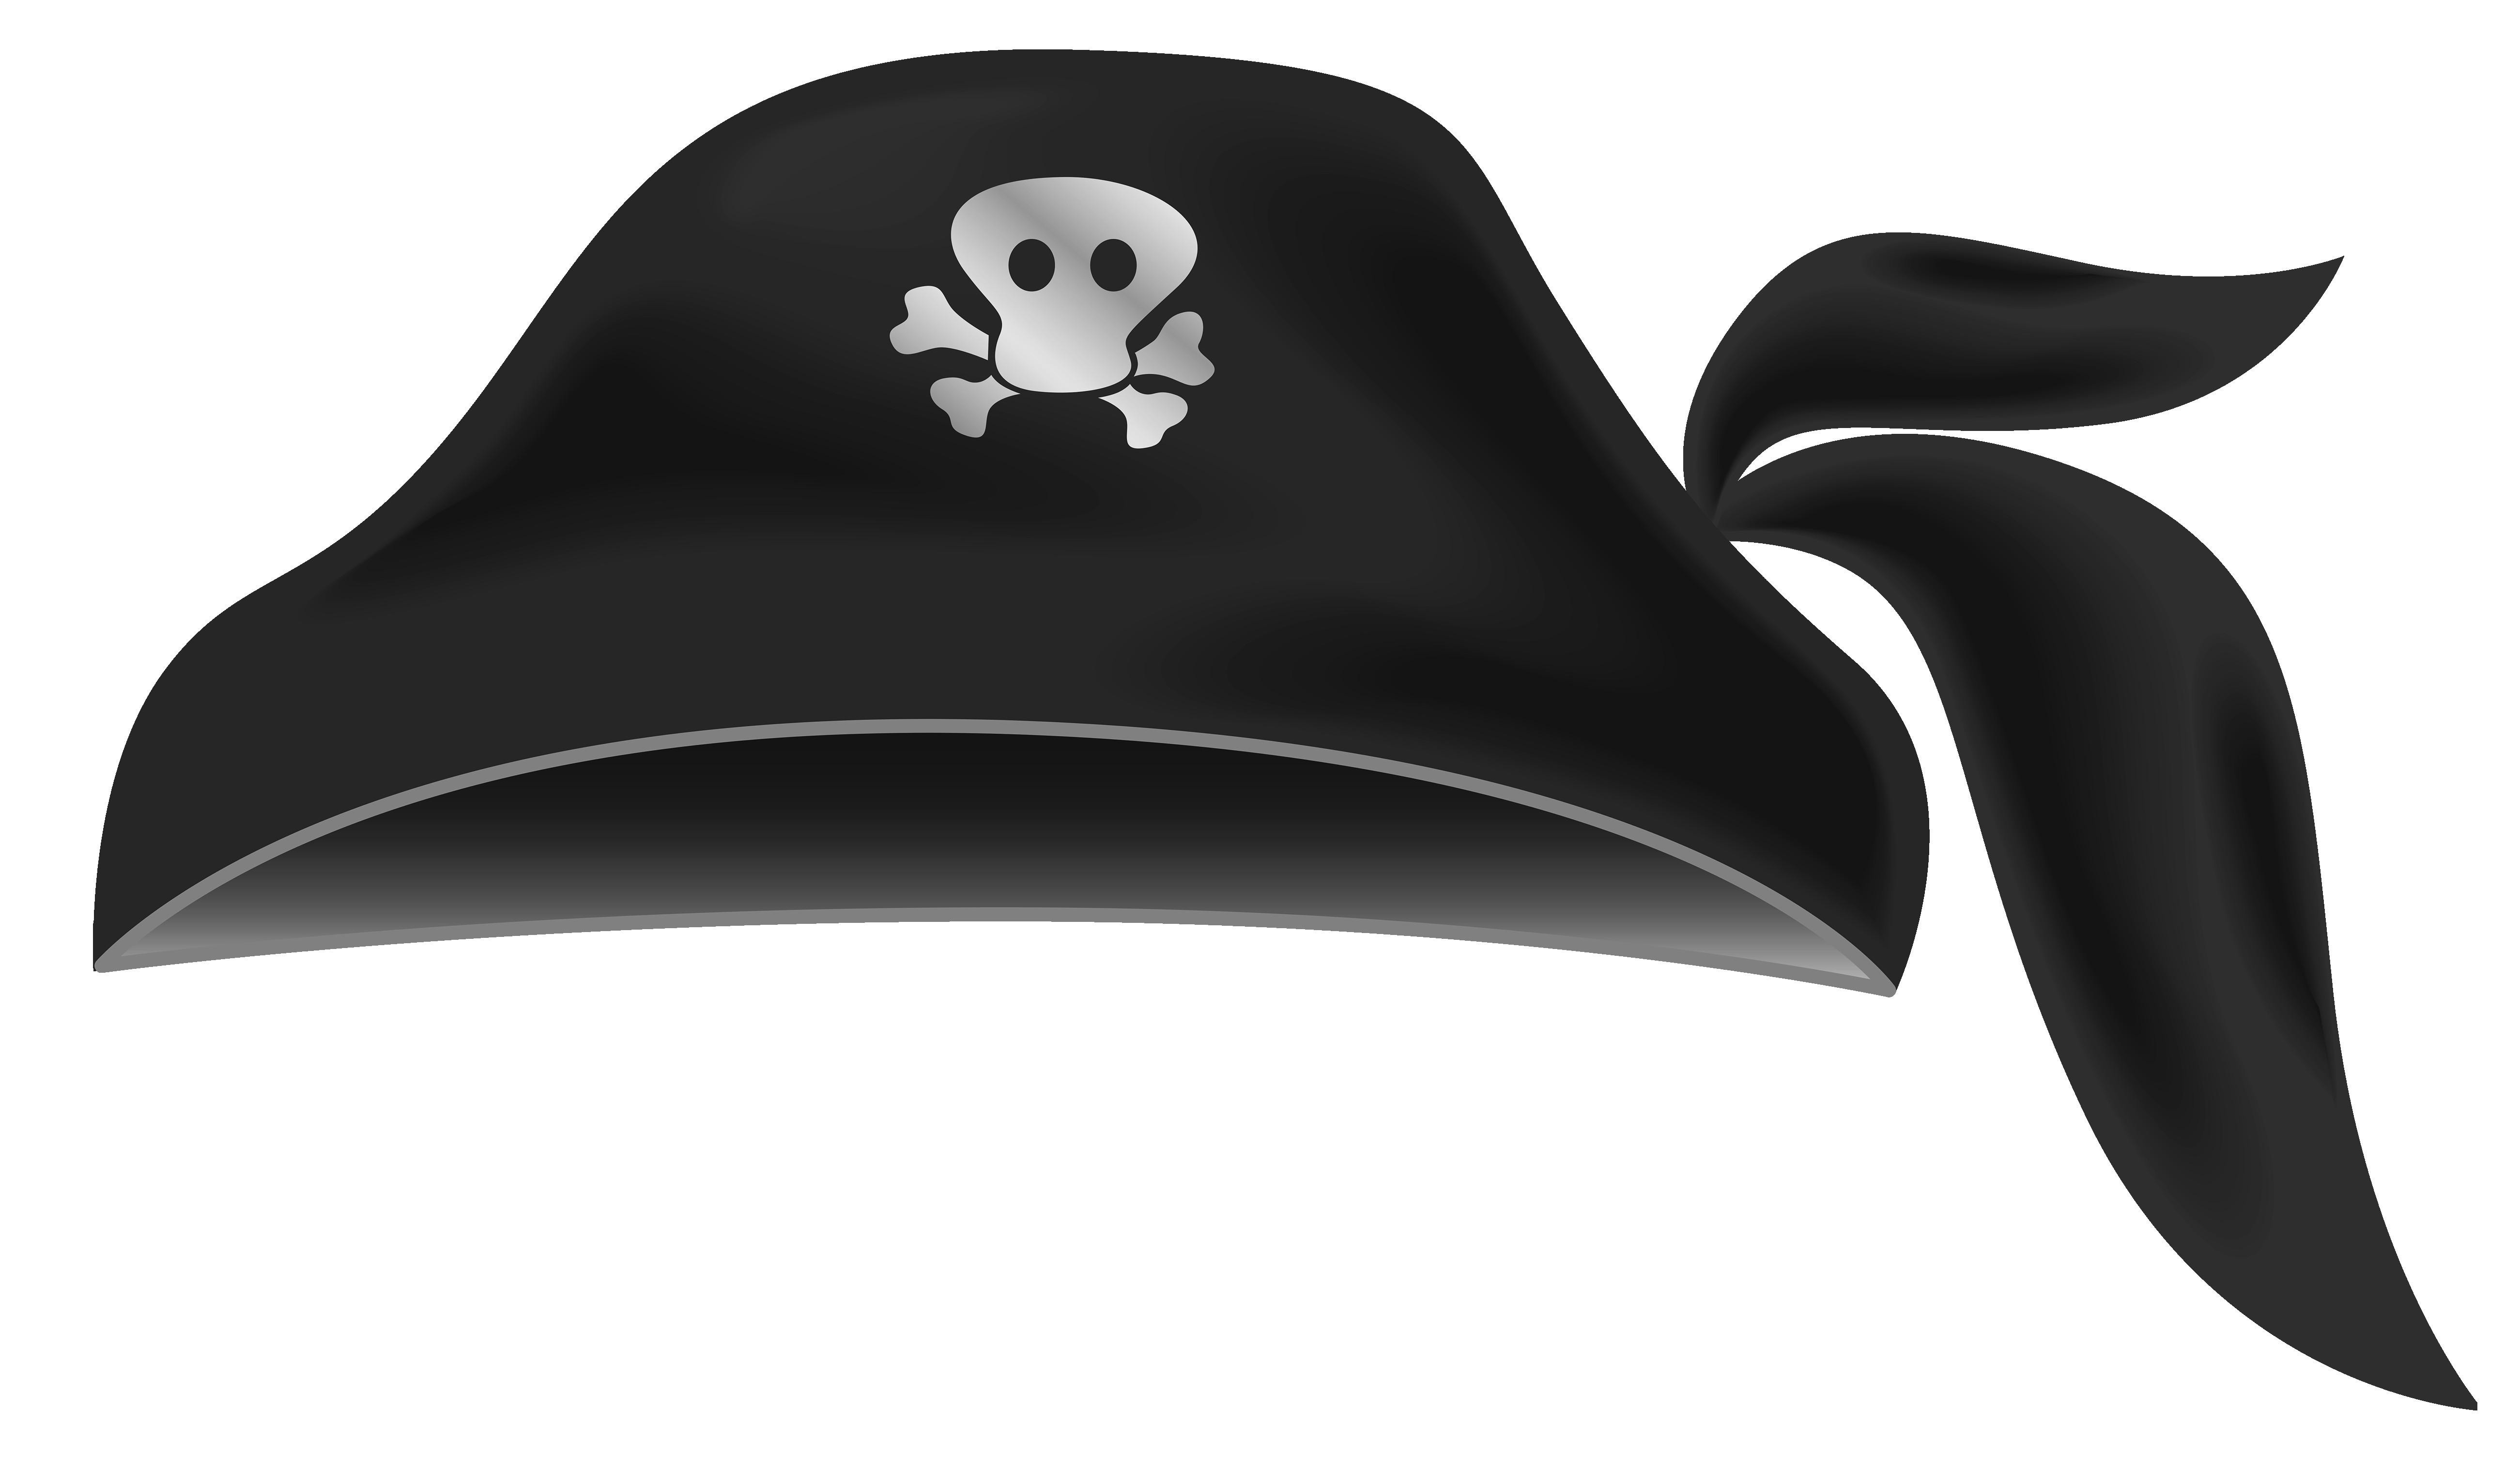 Bandana clipart pirate hat. Thatswhatsup black gallery yopriceville